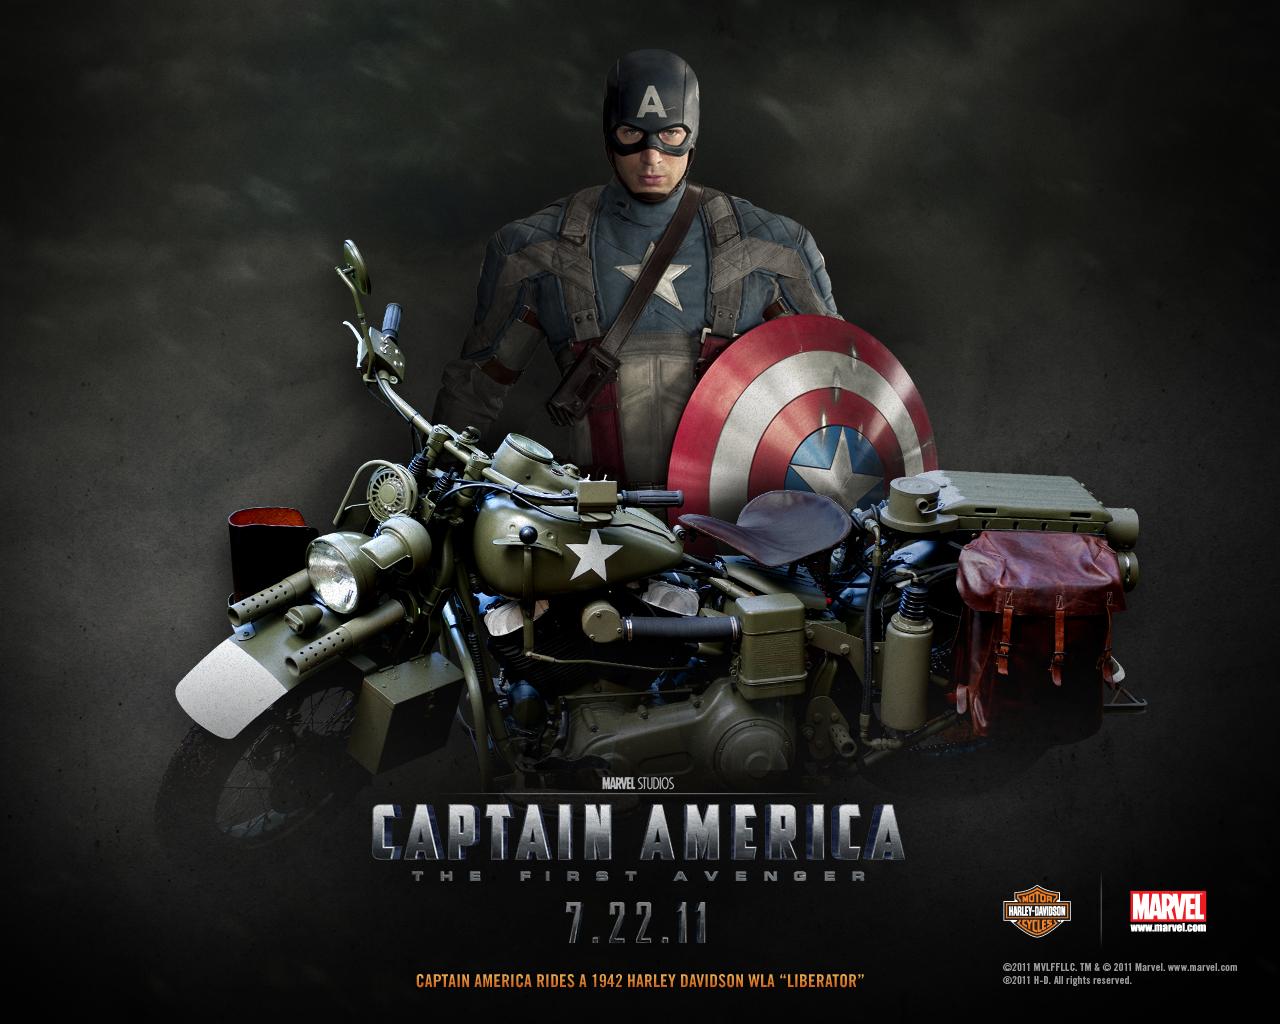 http://3.bp.blogspot.com/-gTuF-lmjnSA/ThXGsv7gF_I/AAAAAAAAI7o/uTvZPaJwH1A/s1600/03_CaptainAmerica_1280x1024.jpg